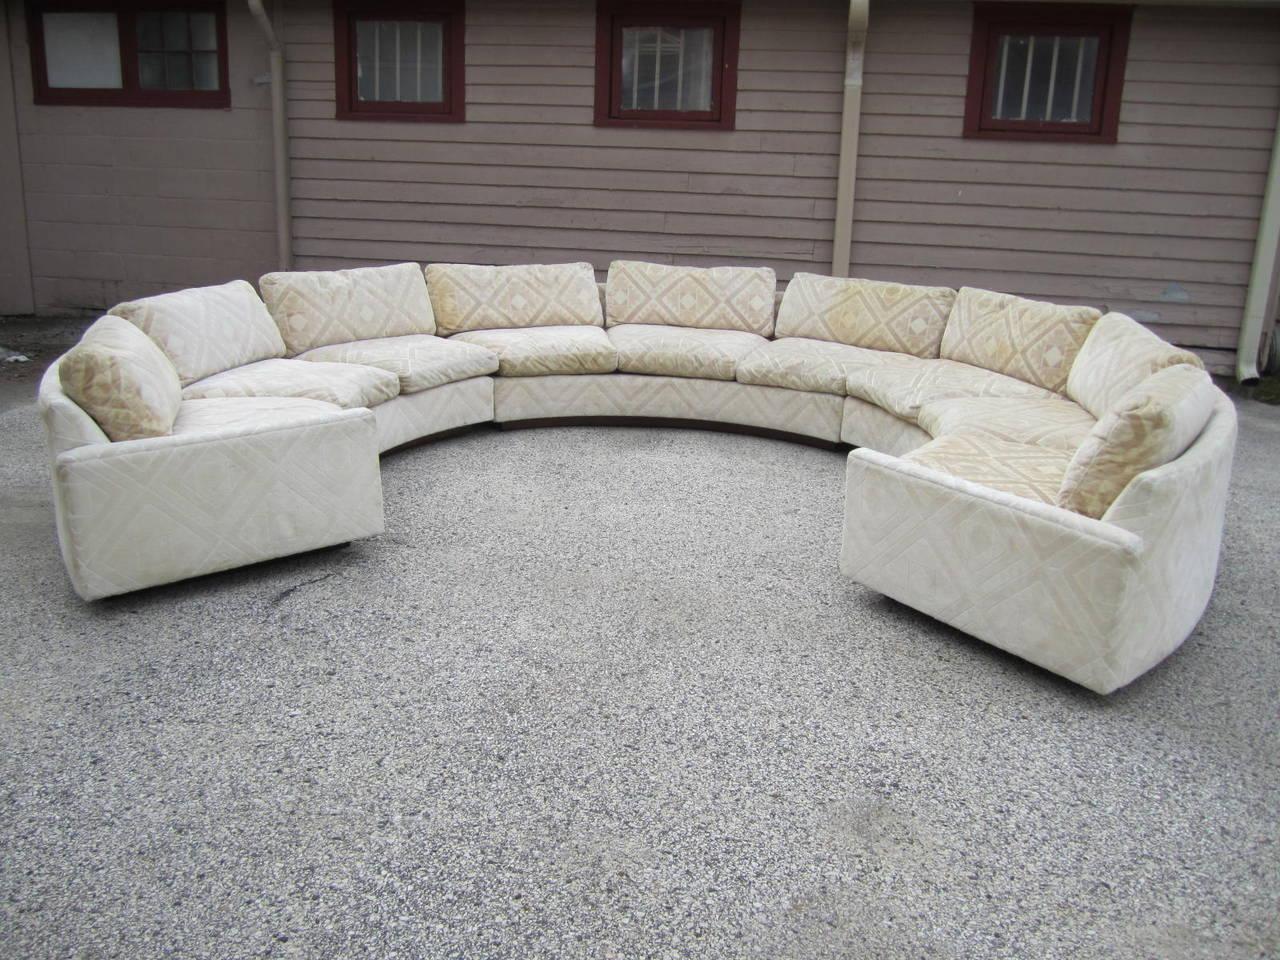 Gentil American Spectacular Three Piece Milo Baughman Circular Sofa, Mid Century Modern  Curved For